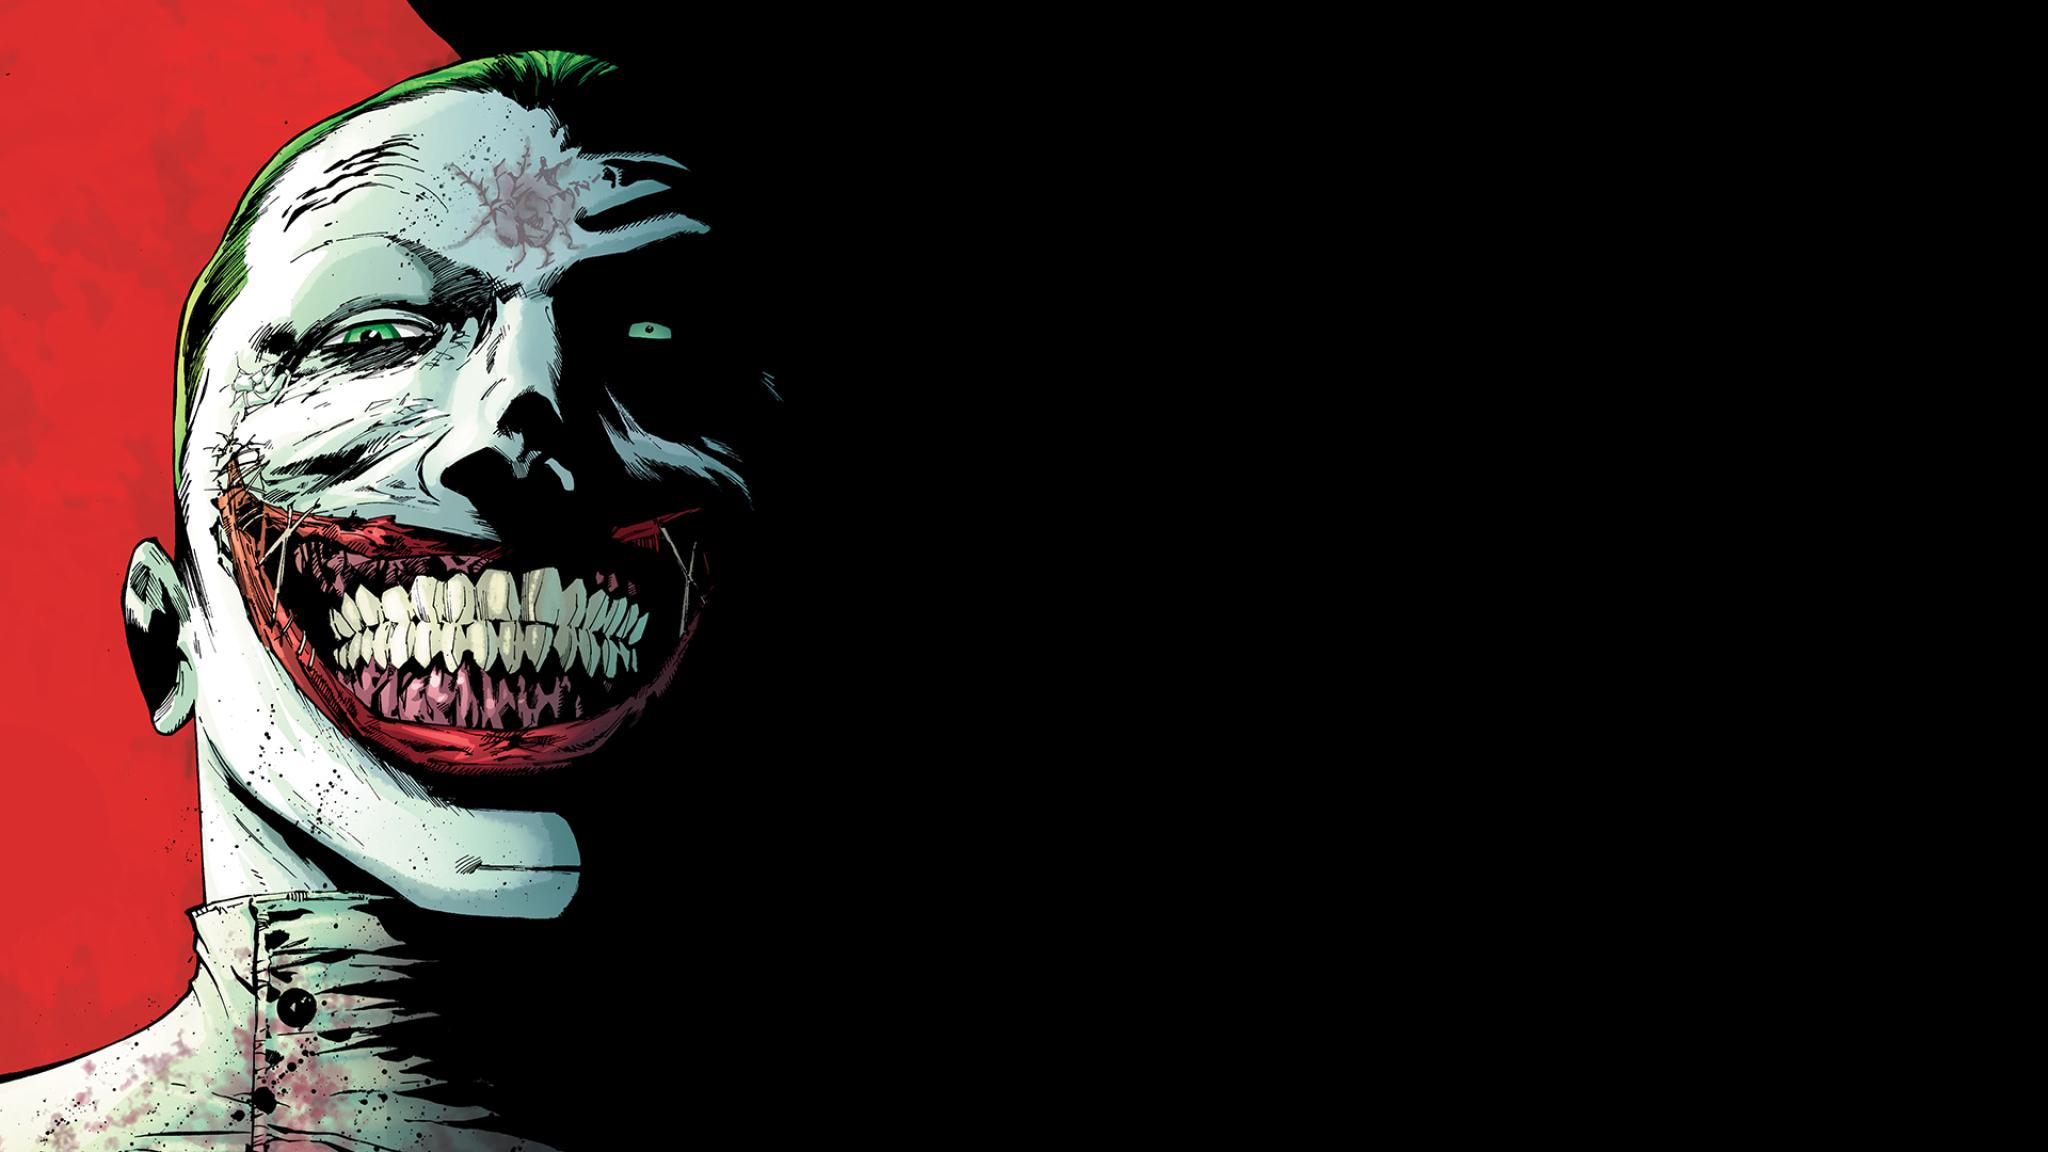 2048x1152 Joker Dc Comic 2048x1152 Resolution Wallpaper Hd